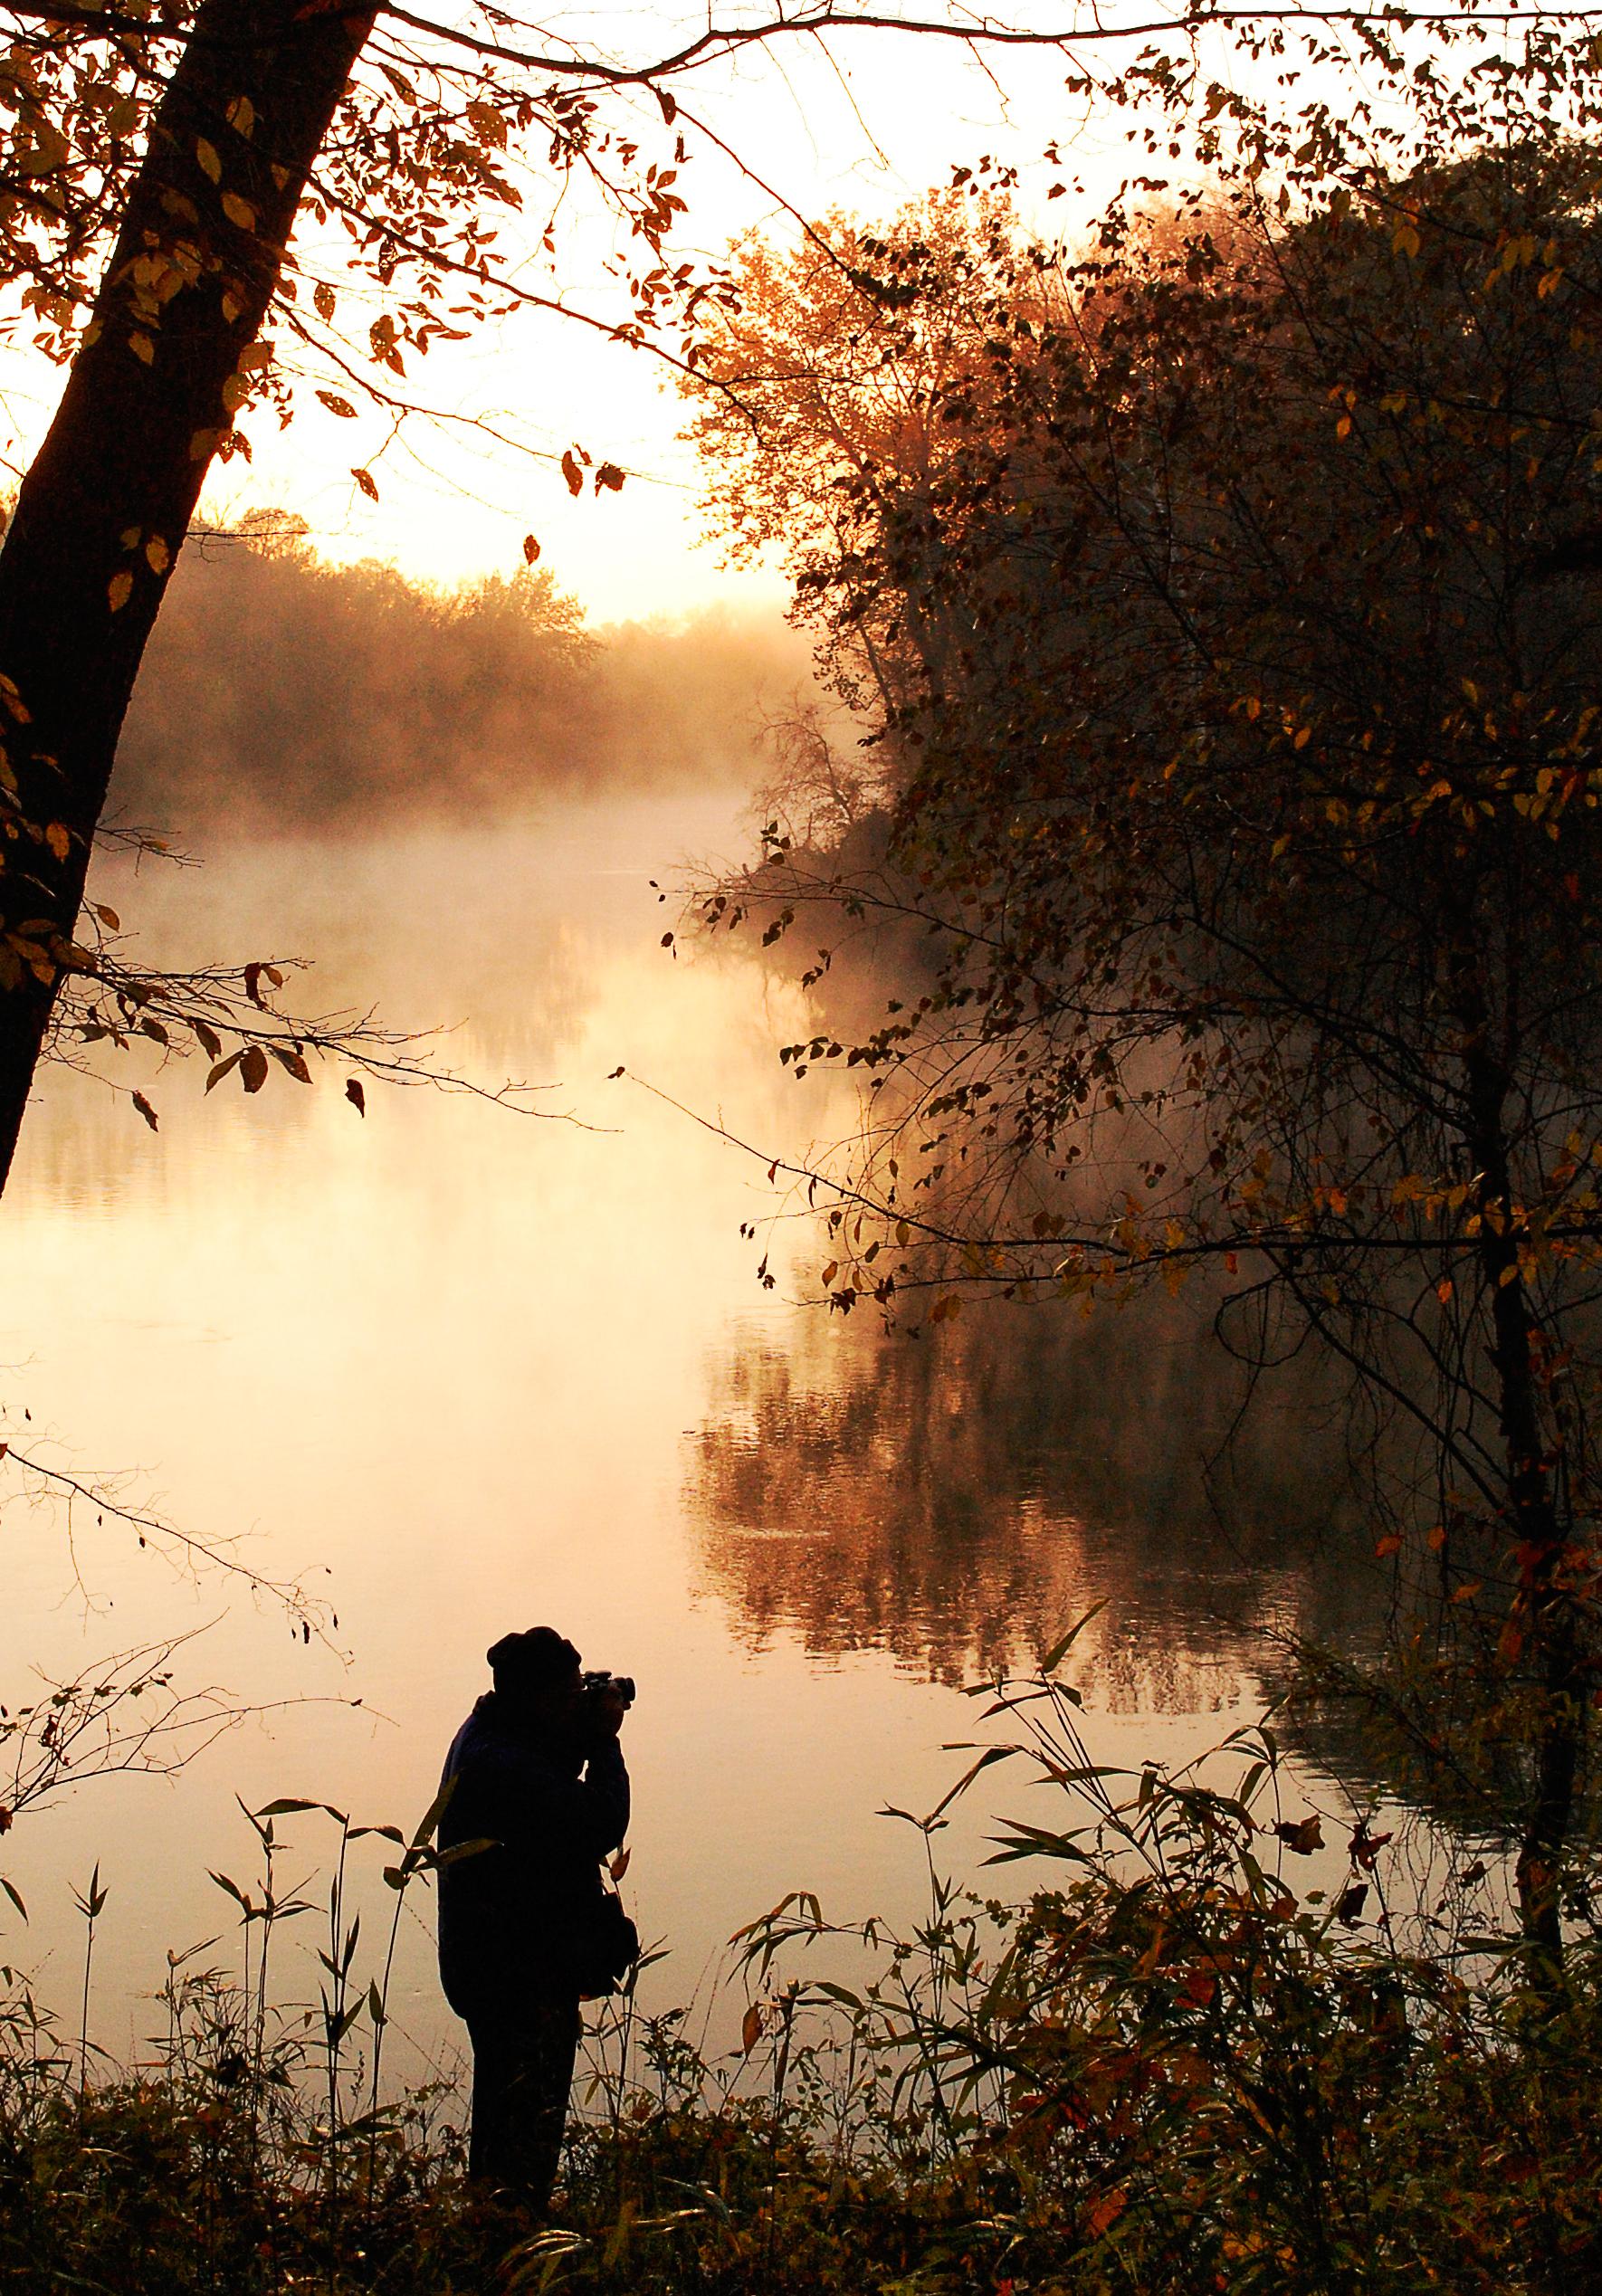 National Geographic Photographer Portrait, McIntosh Reserve, Whitesburg, GA